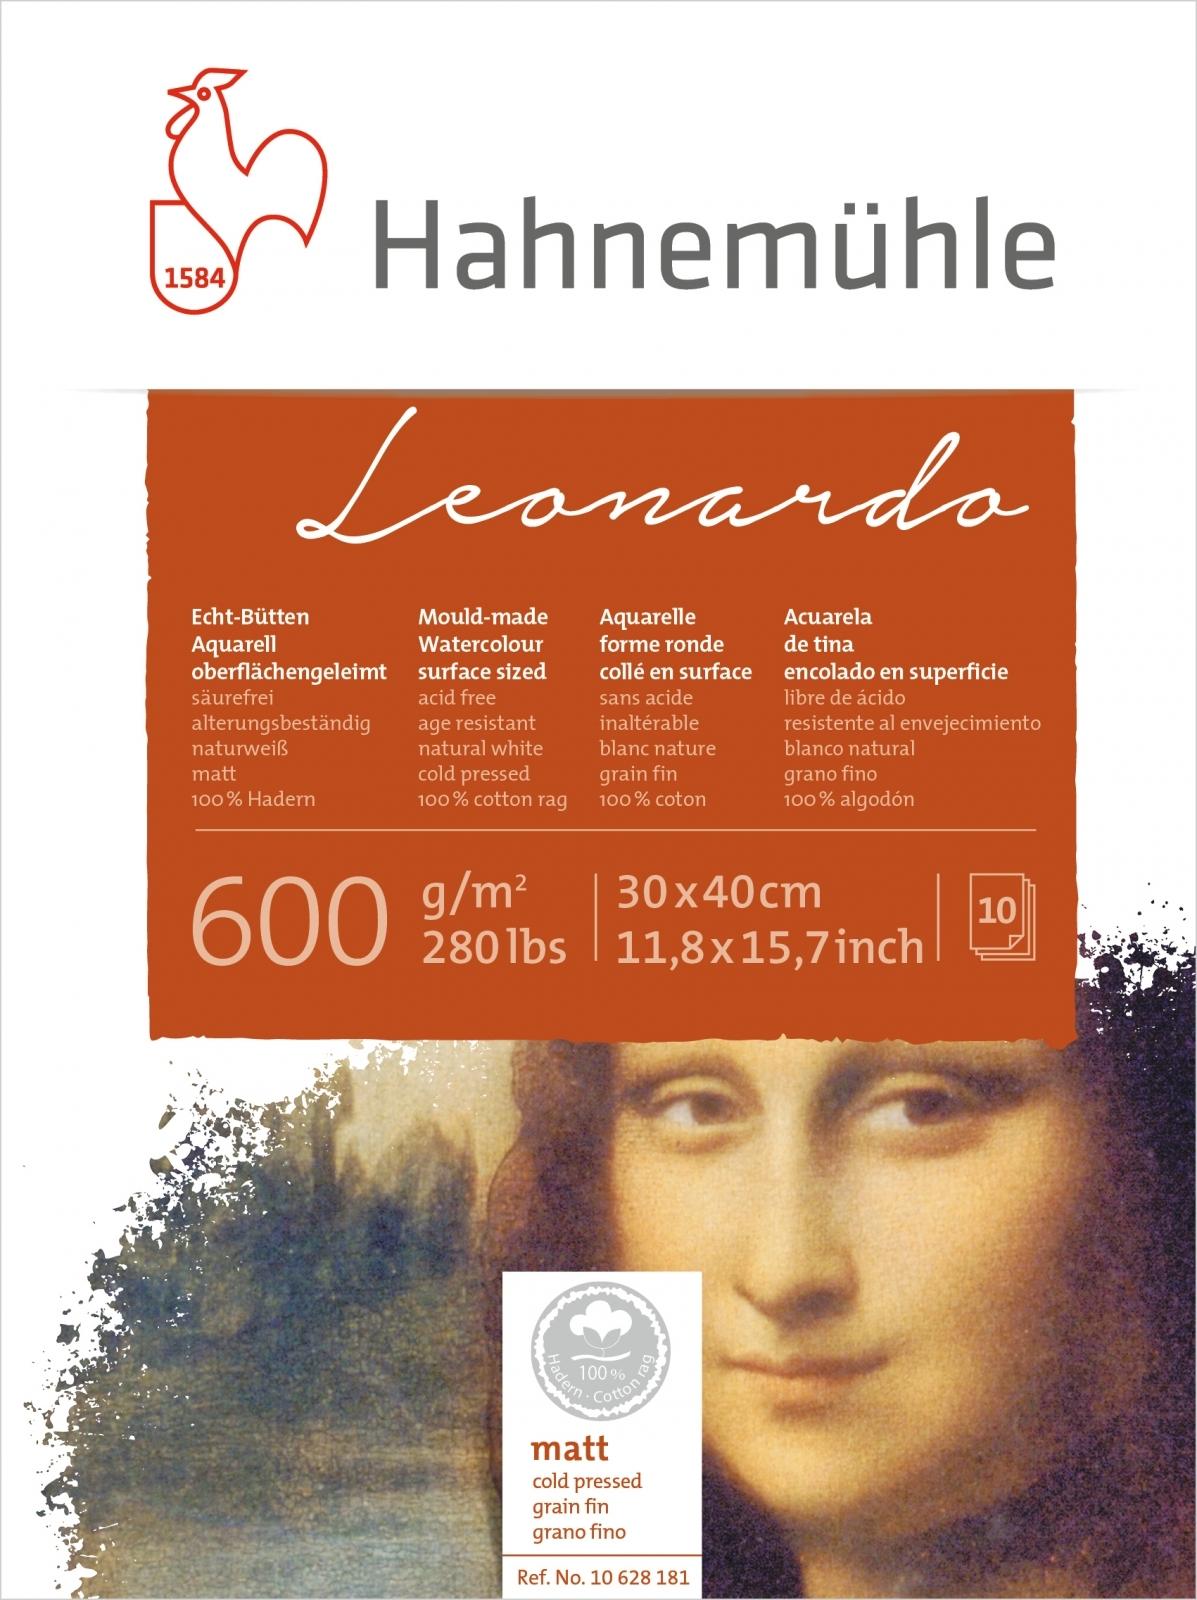 Papel Hahnemuhle Leonardo Textura Fina 600g/m2 30x40 10fls 1 - Papelaria Botafogo